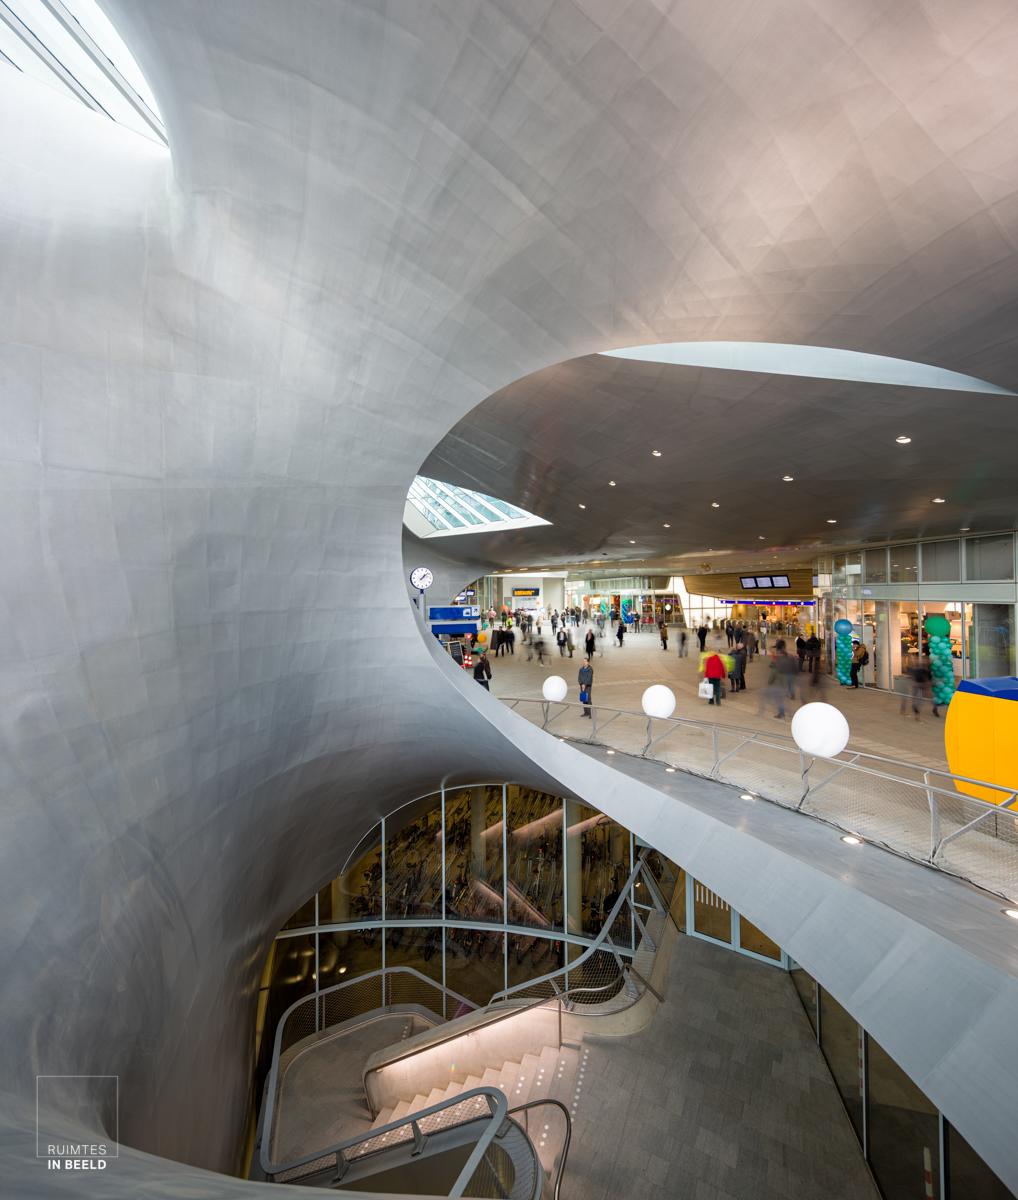 Interieur van het nieuwe Centraal Station in Arnhem   Interior of the newly build Central Station in Arnhem, Netherlands.